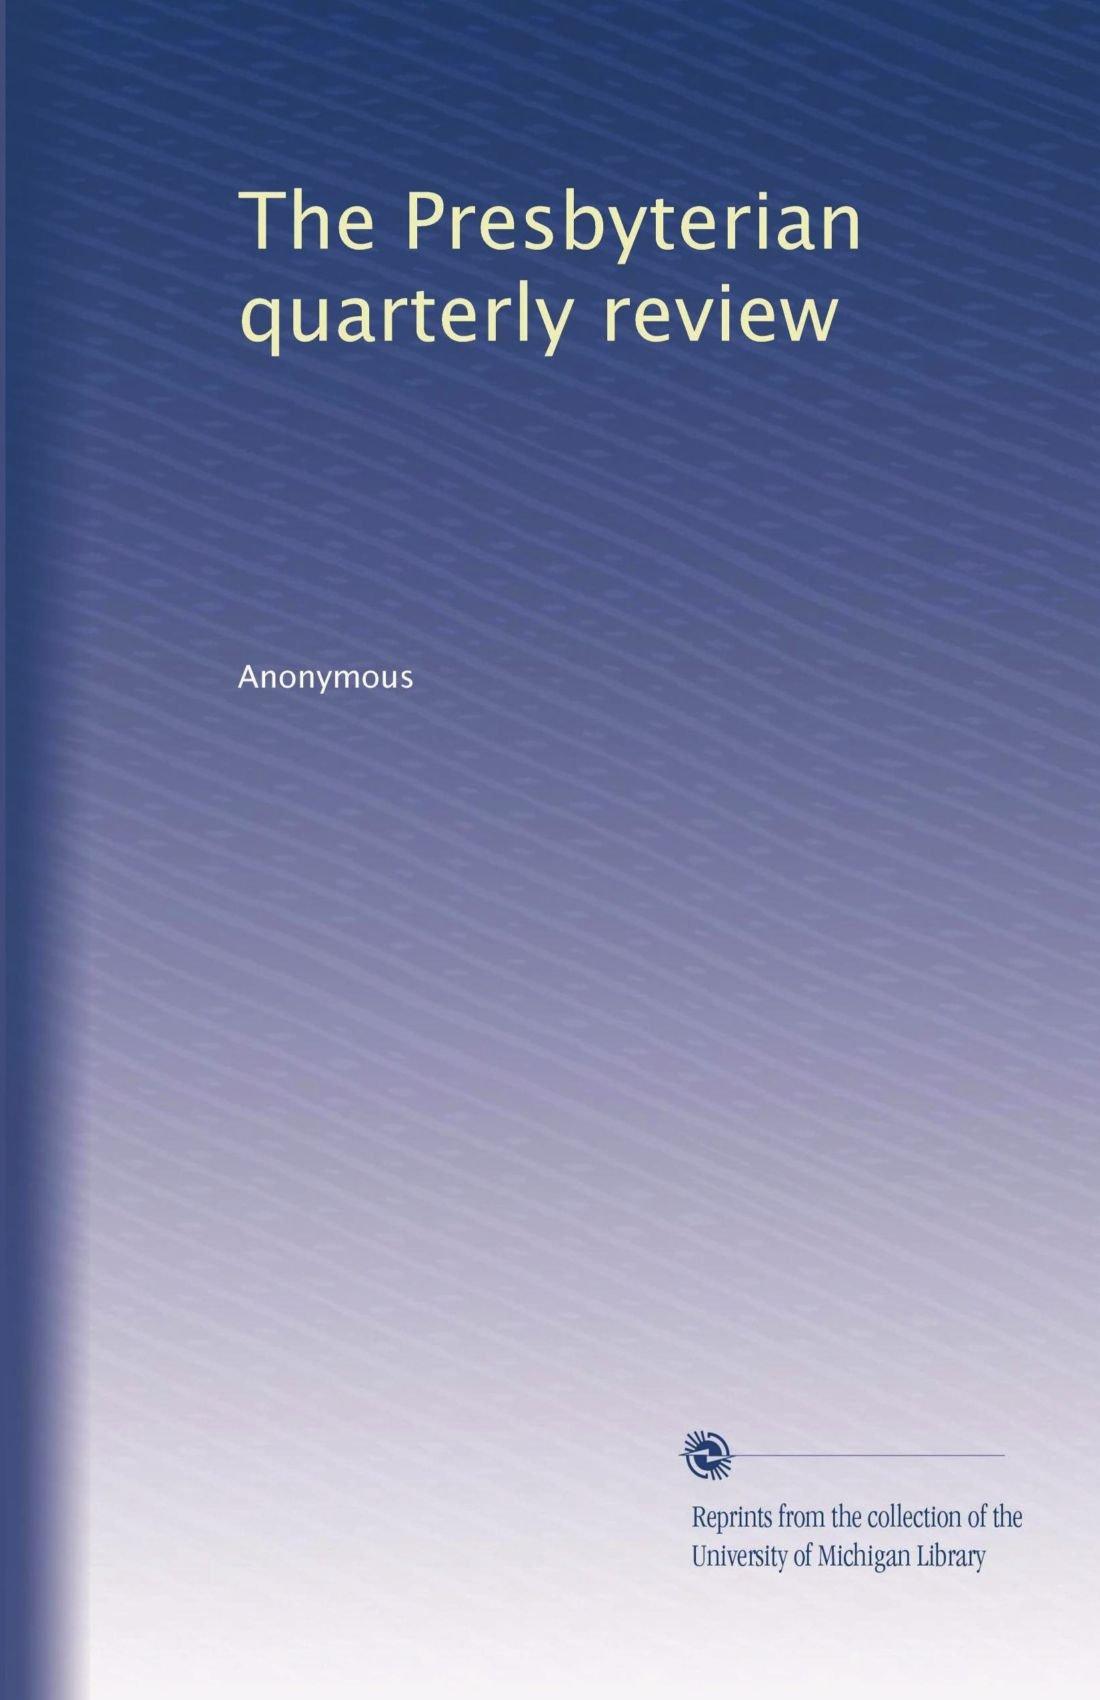 The Presbyterian quarterly review (Volume 7) ebook